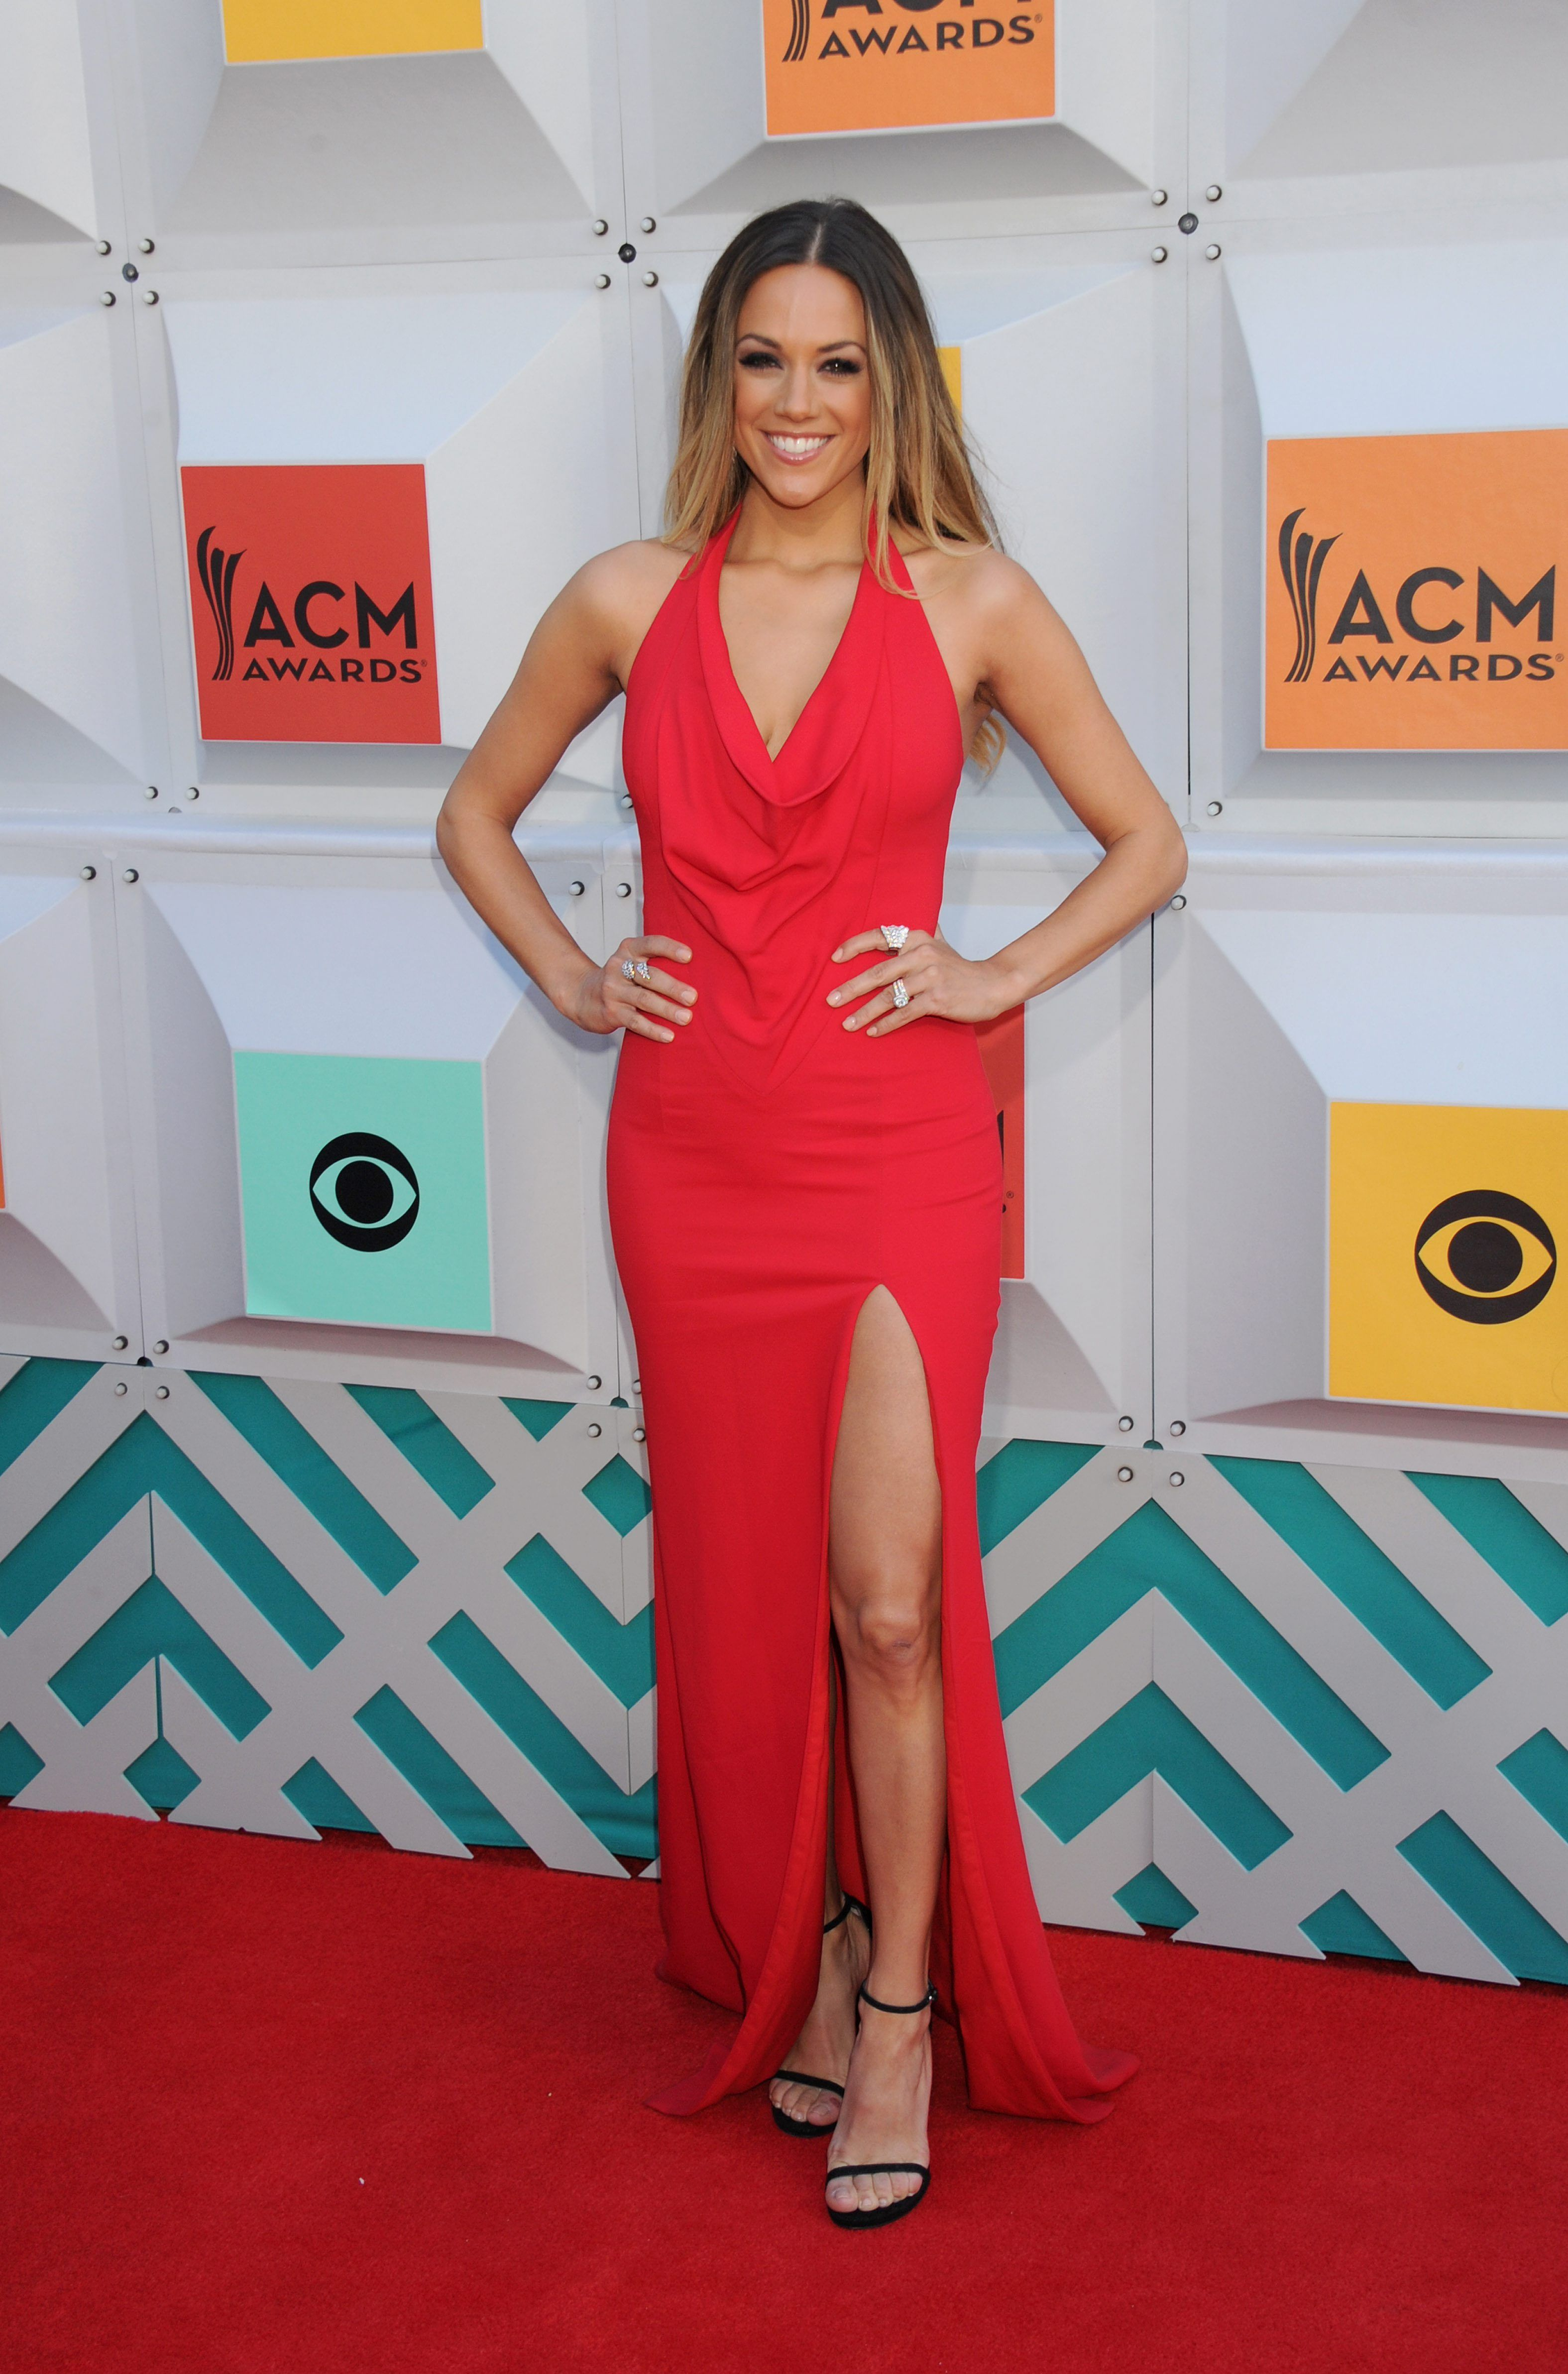 ACM Awards 2016 Red Carpet Arrivals   Celebrity style red